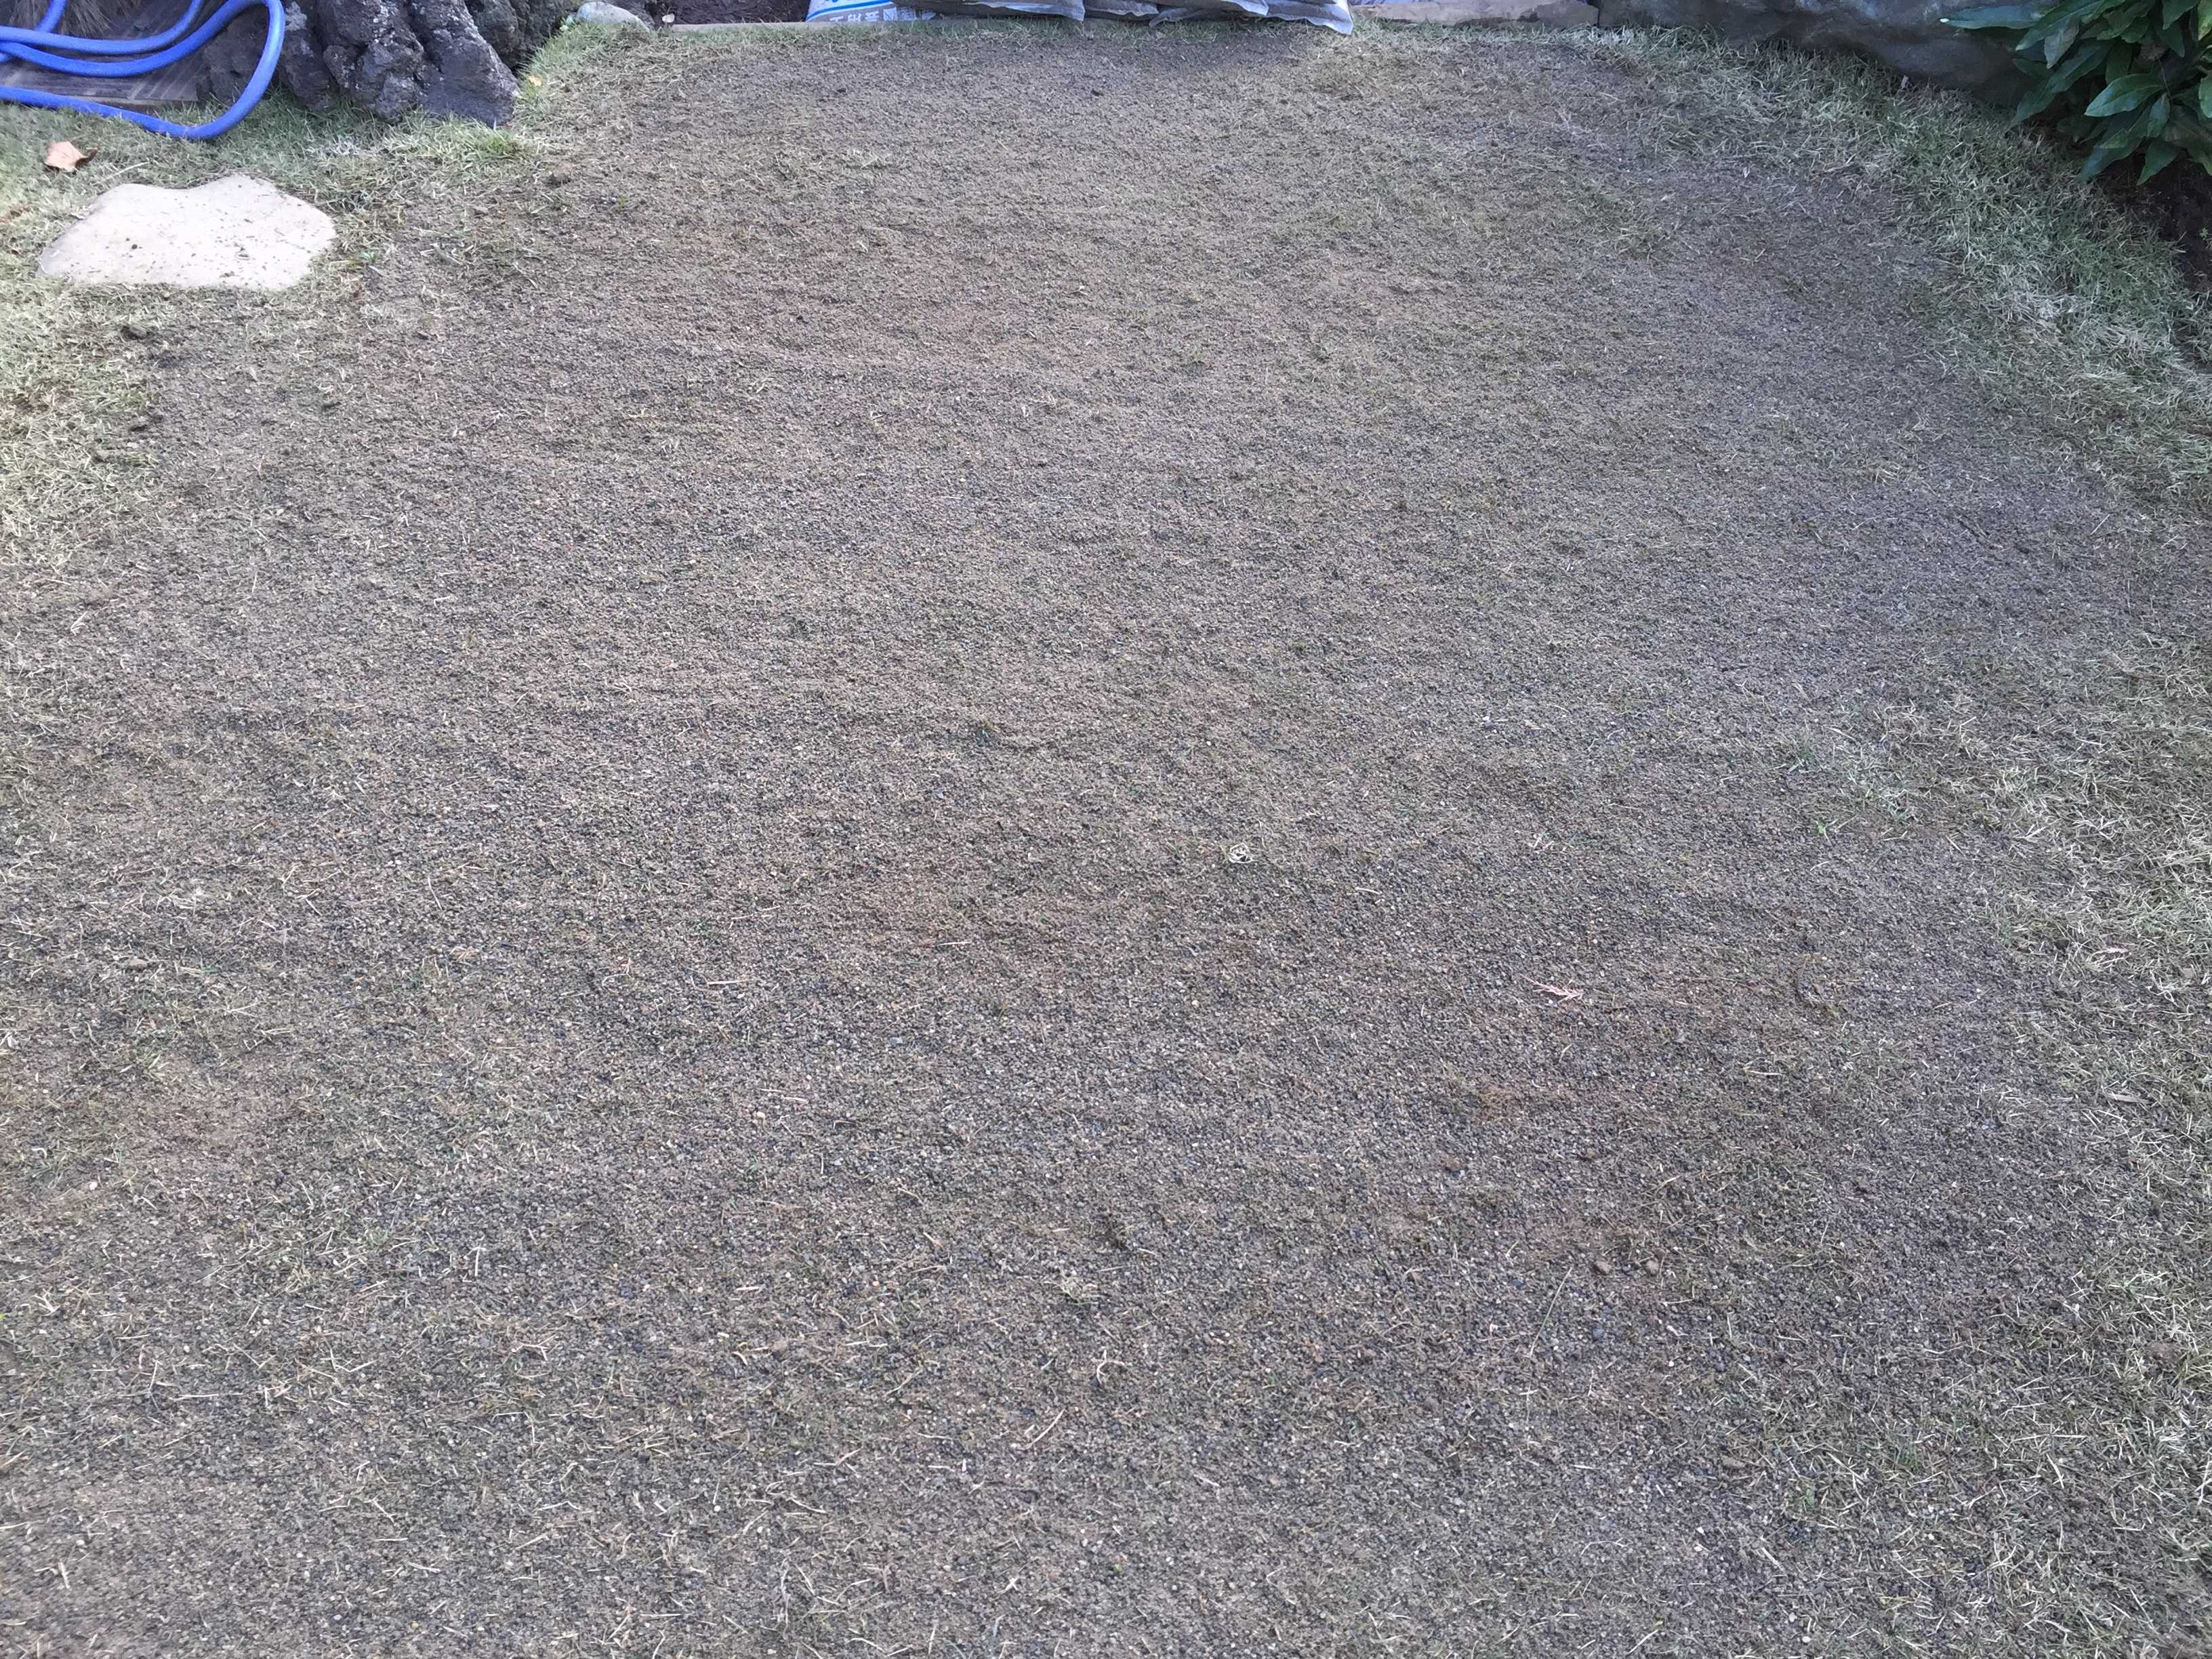 TM9 - 貼り付け後 5ヶ月。目砂を入れた芝生・TM9(ティーエムナイン)